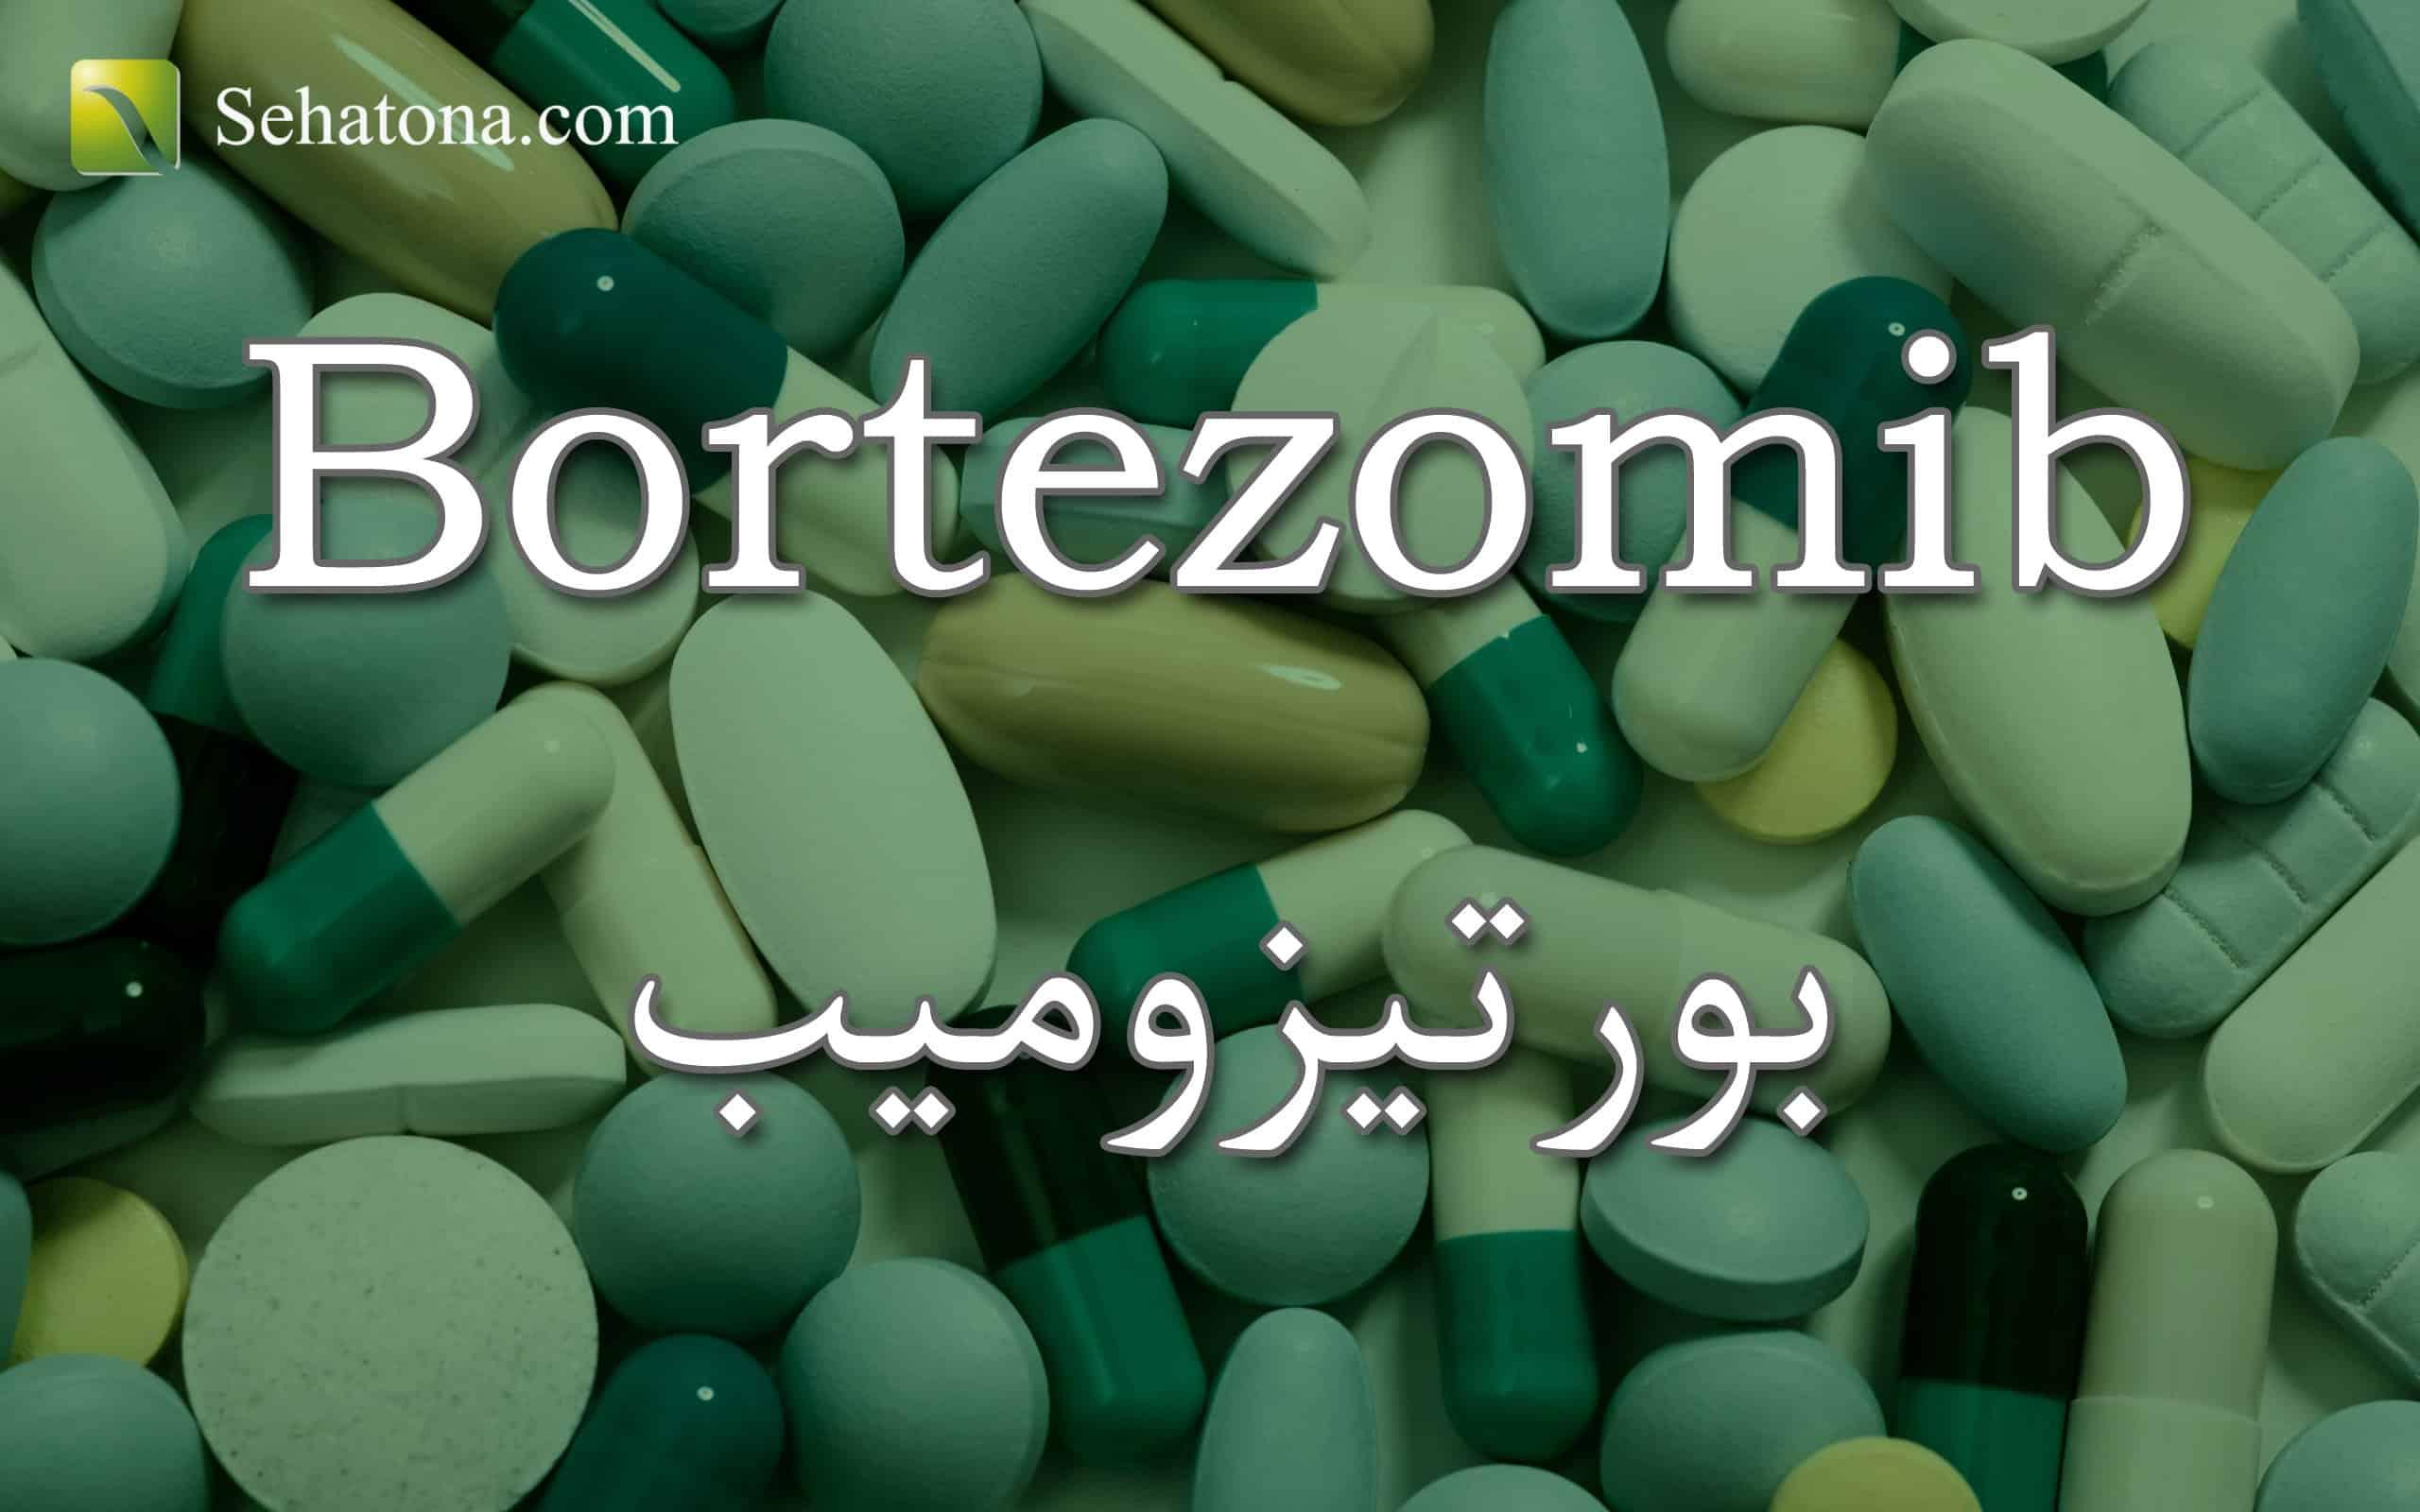 bortezomib